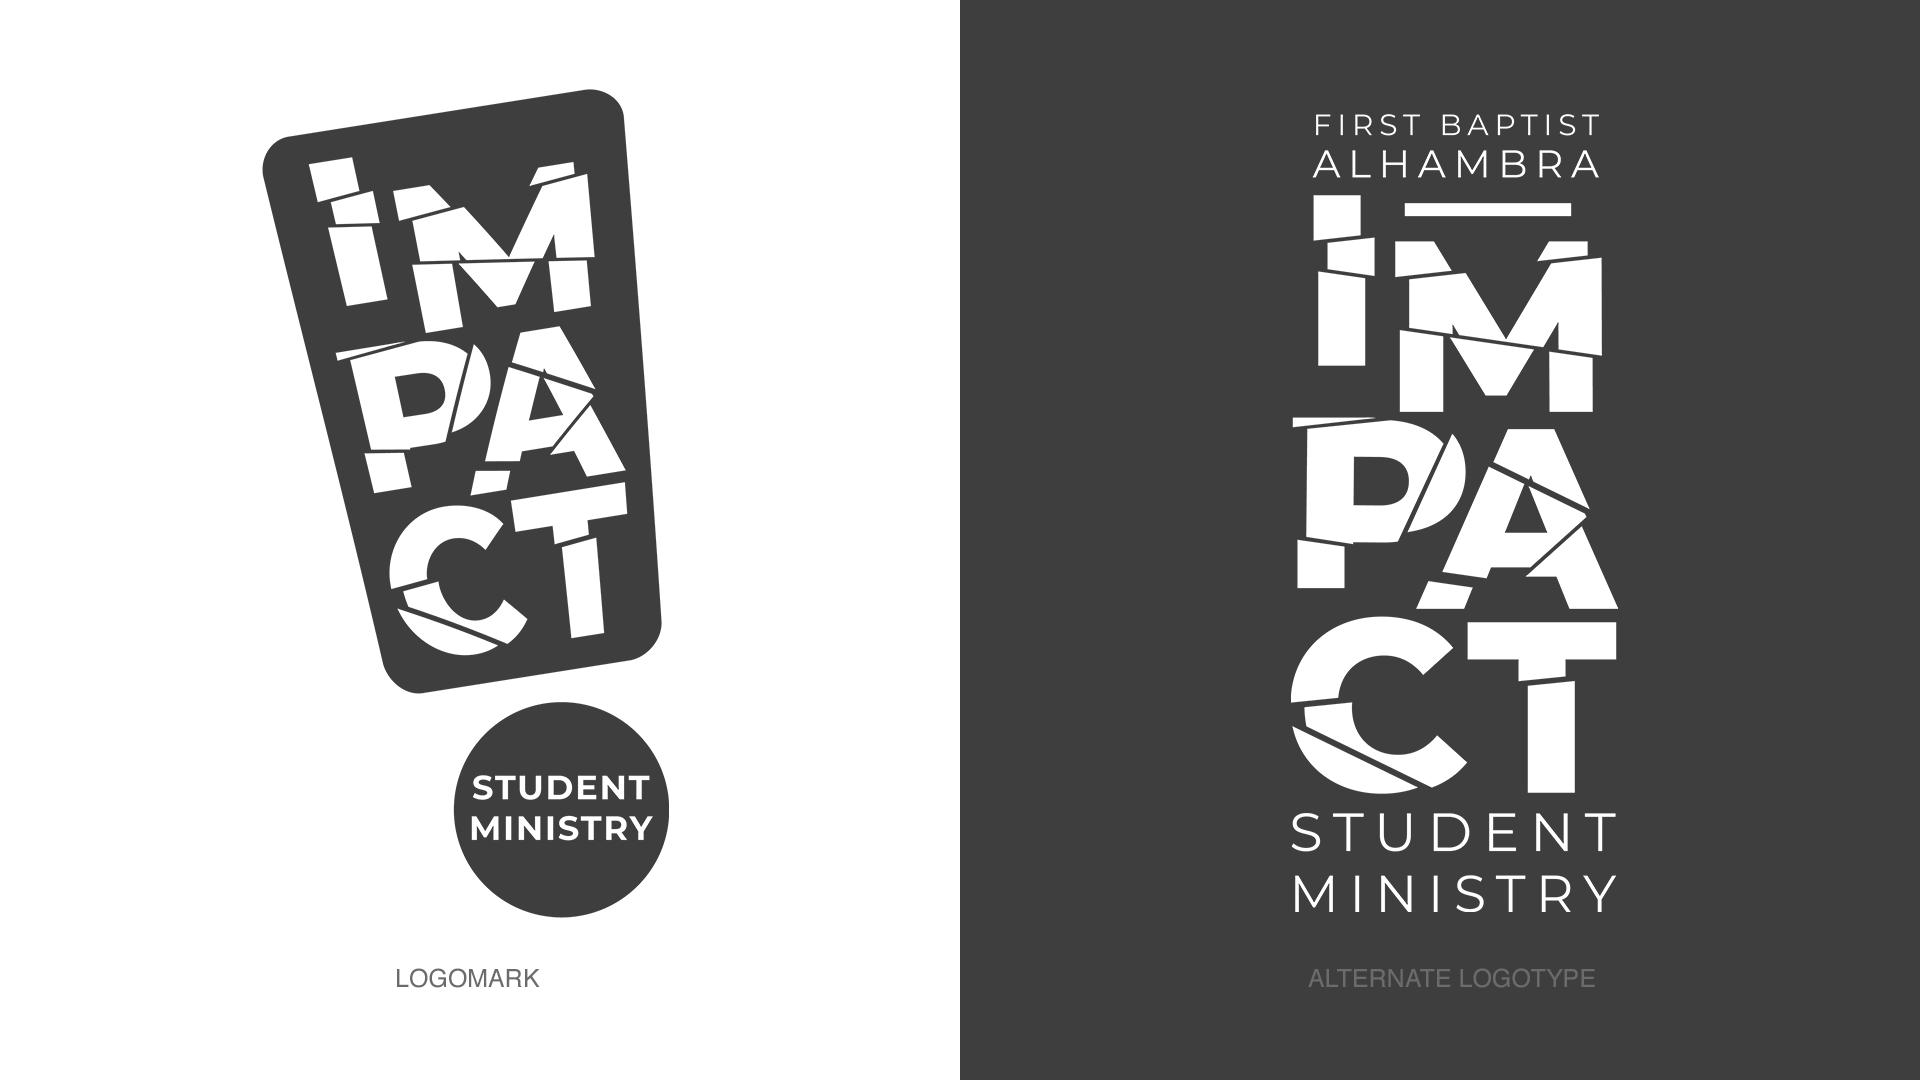 missyrobbsgdp_FBCA_Impact_Logotype_Alternates.png